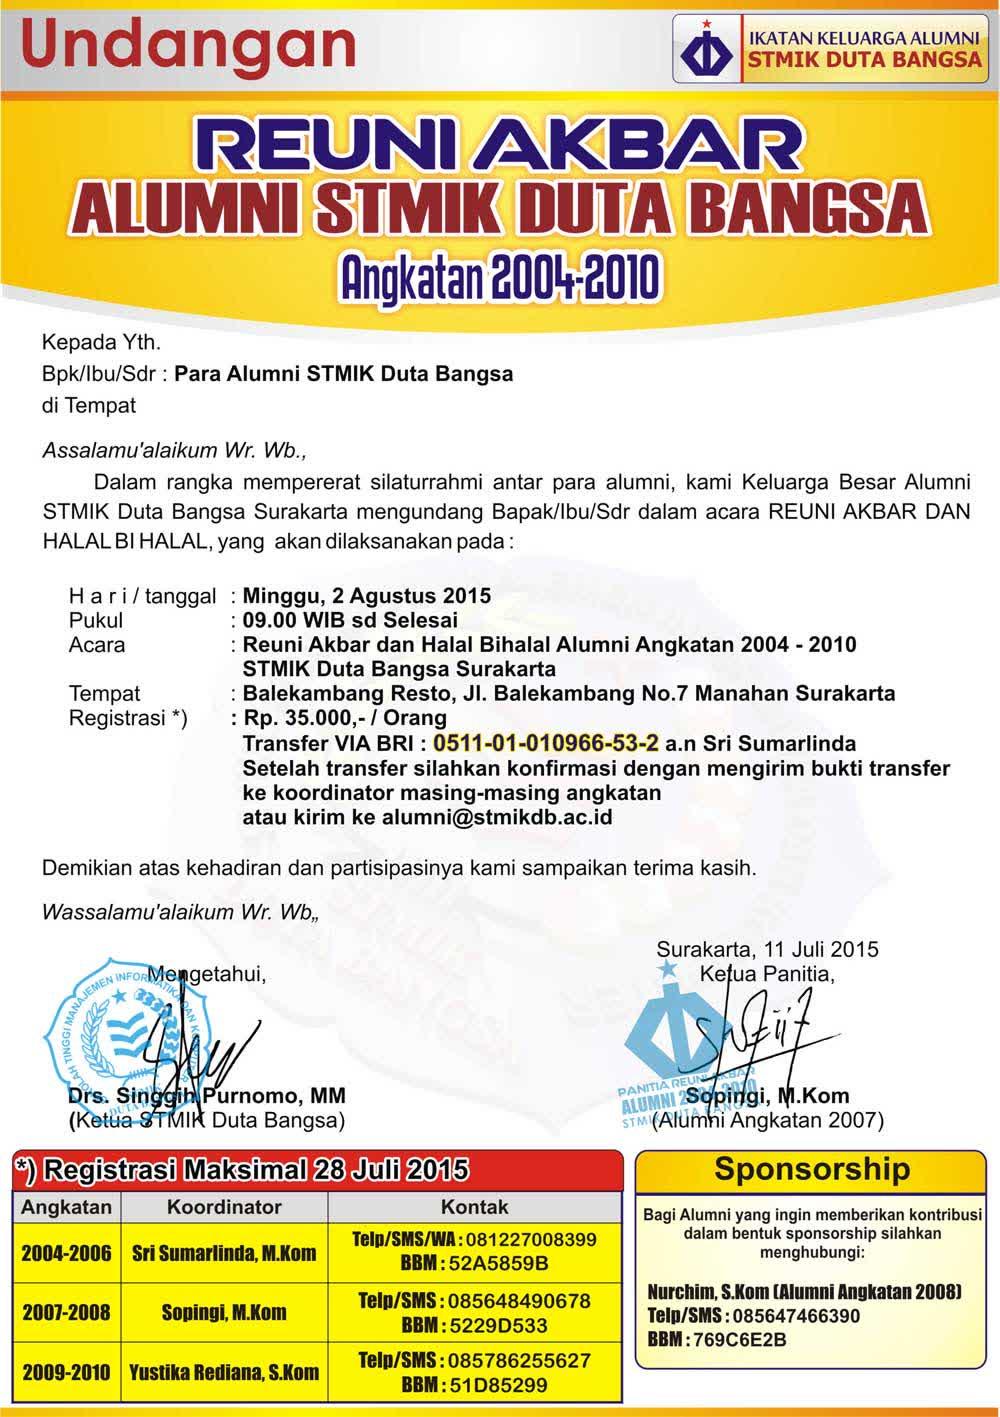 Ilmuku Ilmumu Undangan Reuni Akbar Dan Halal Bi Halal Alumni Stmik